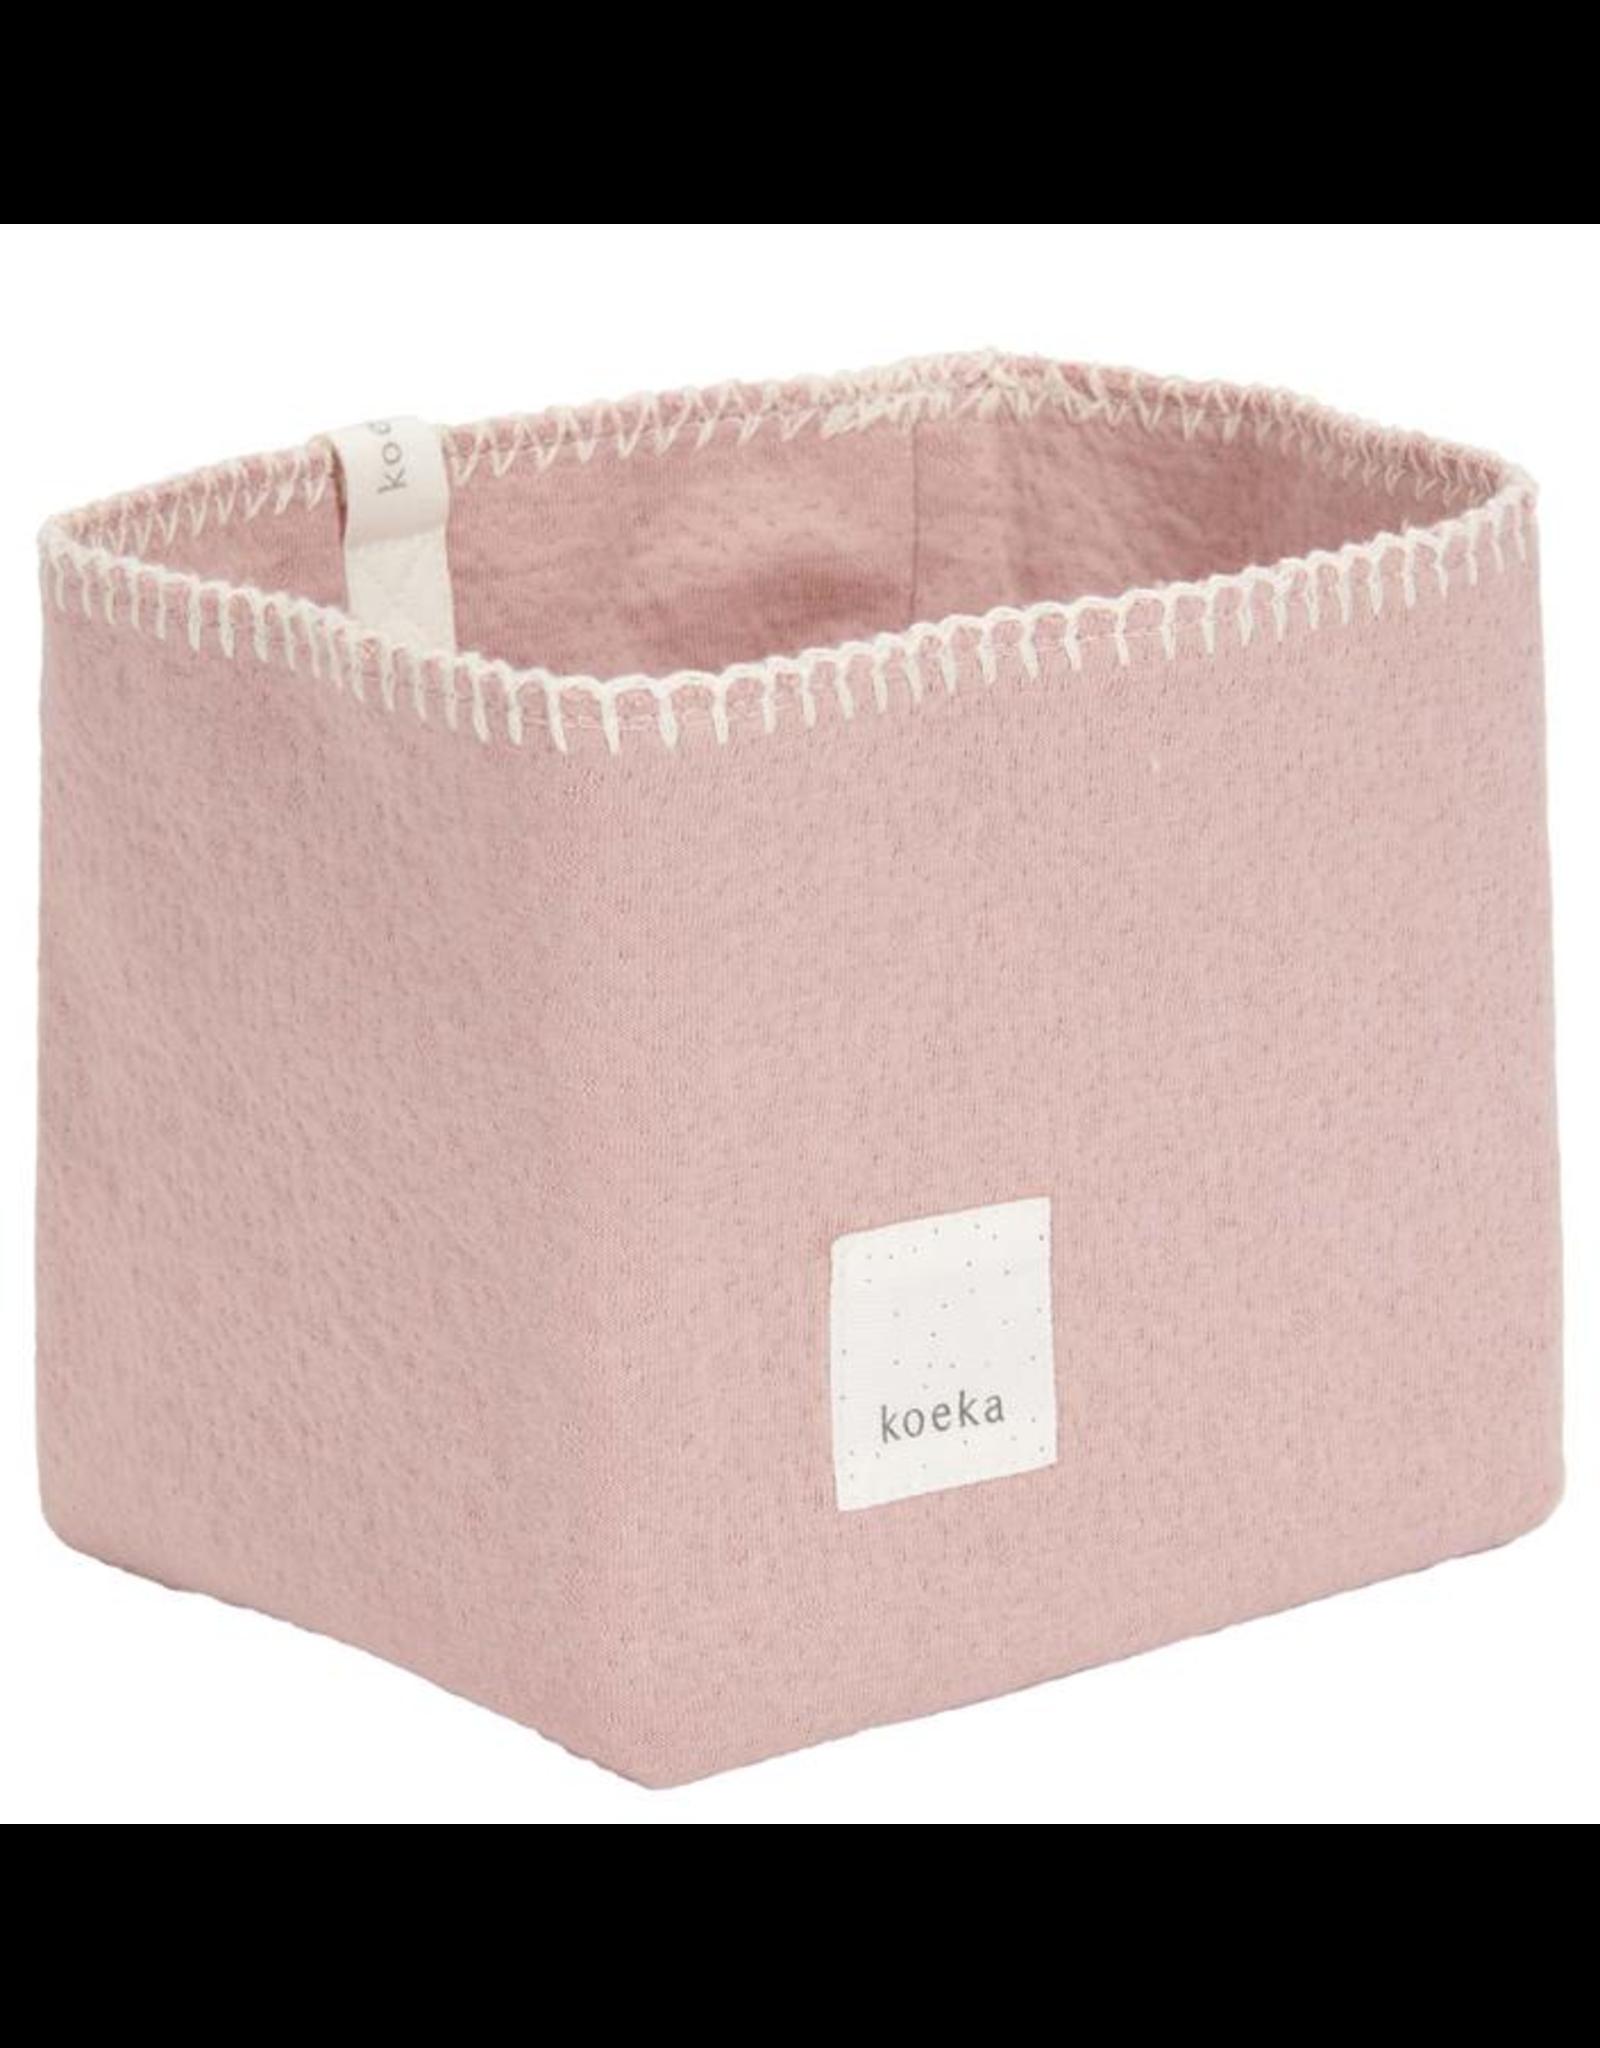 Koeka Storage Basket Runa